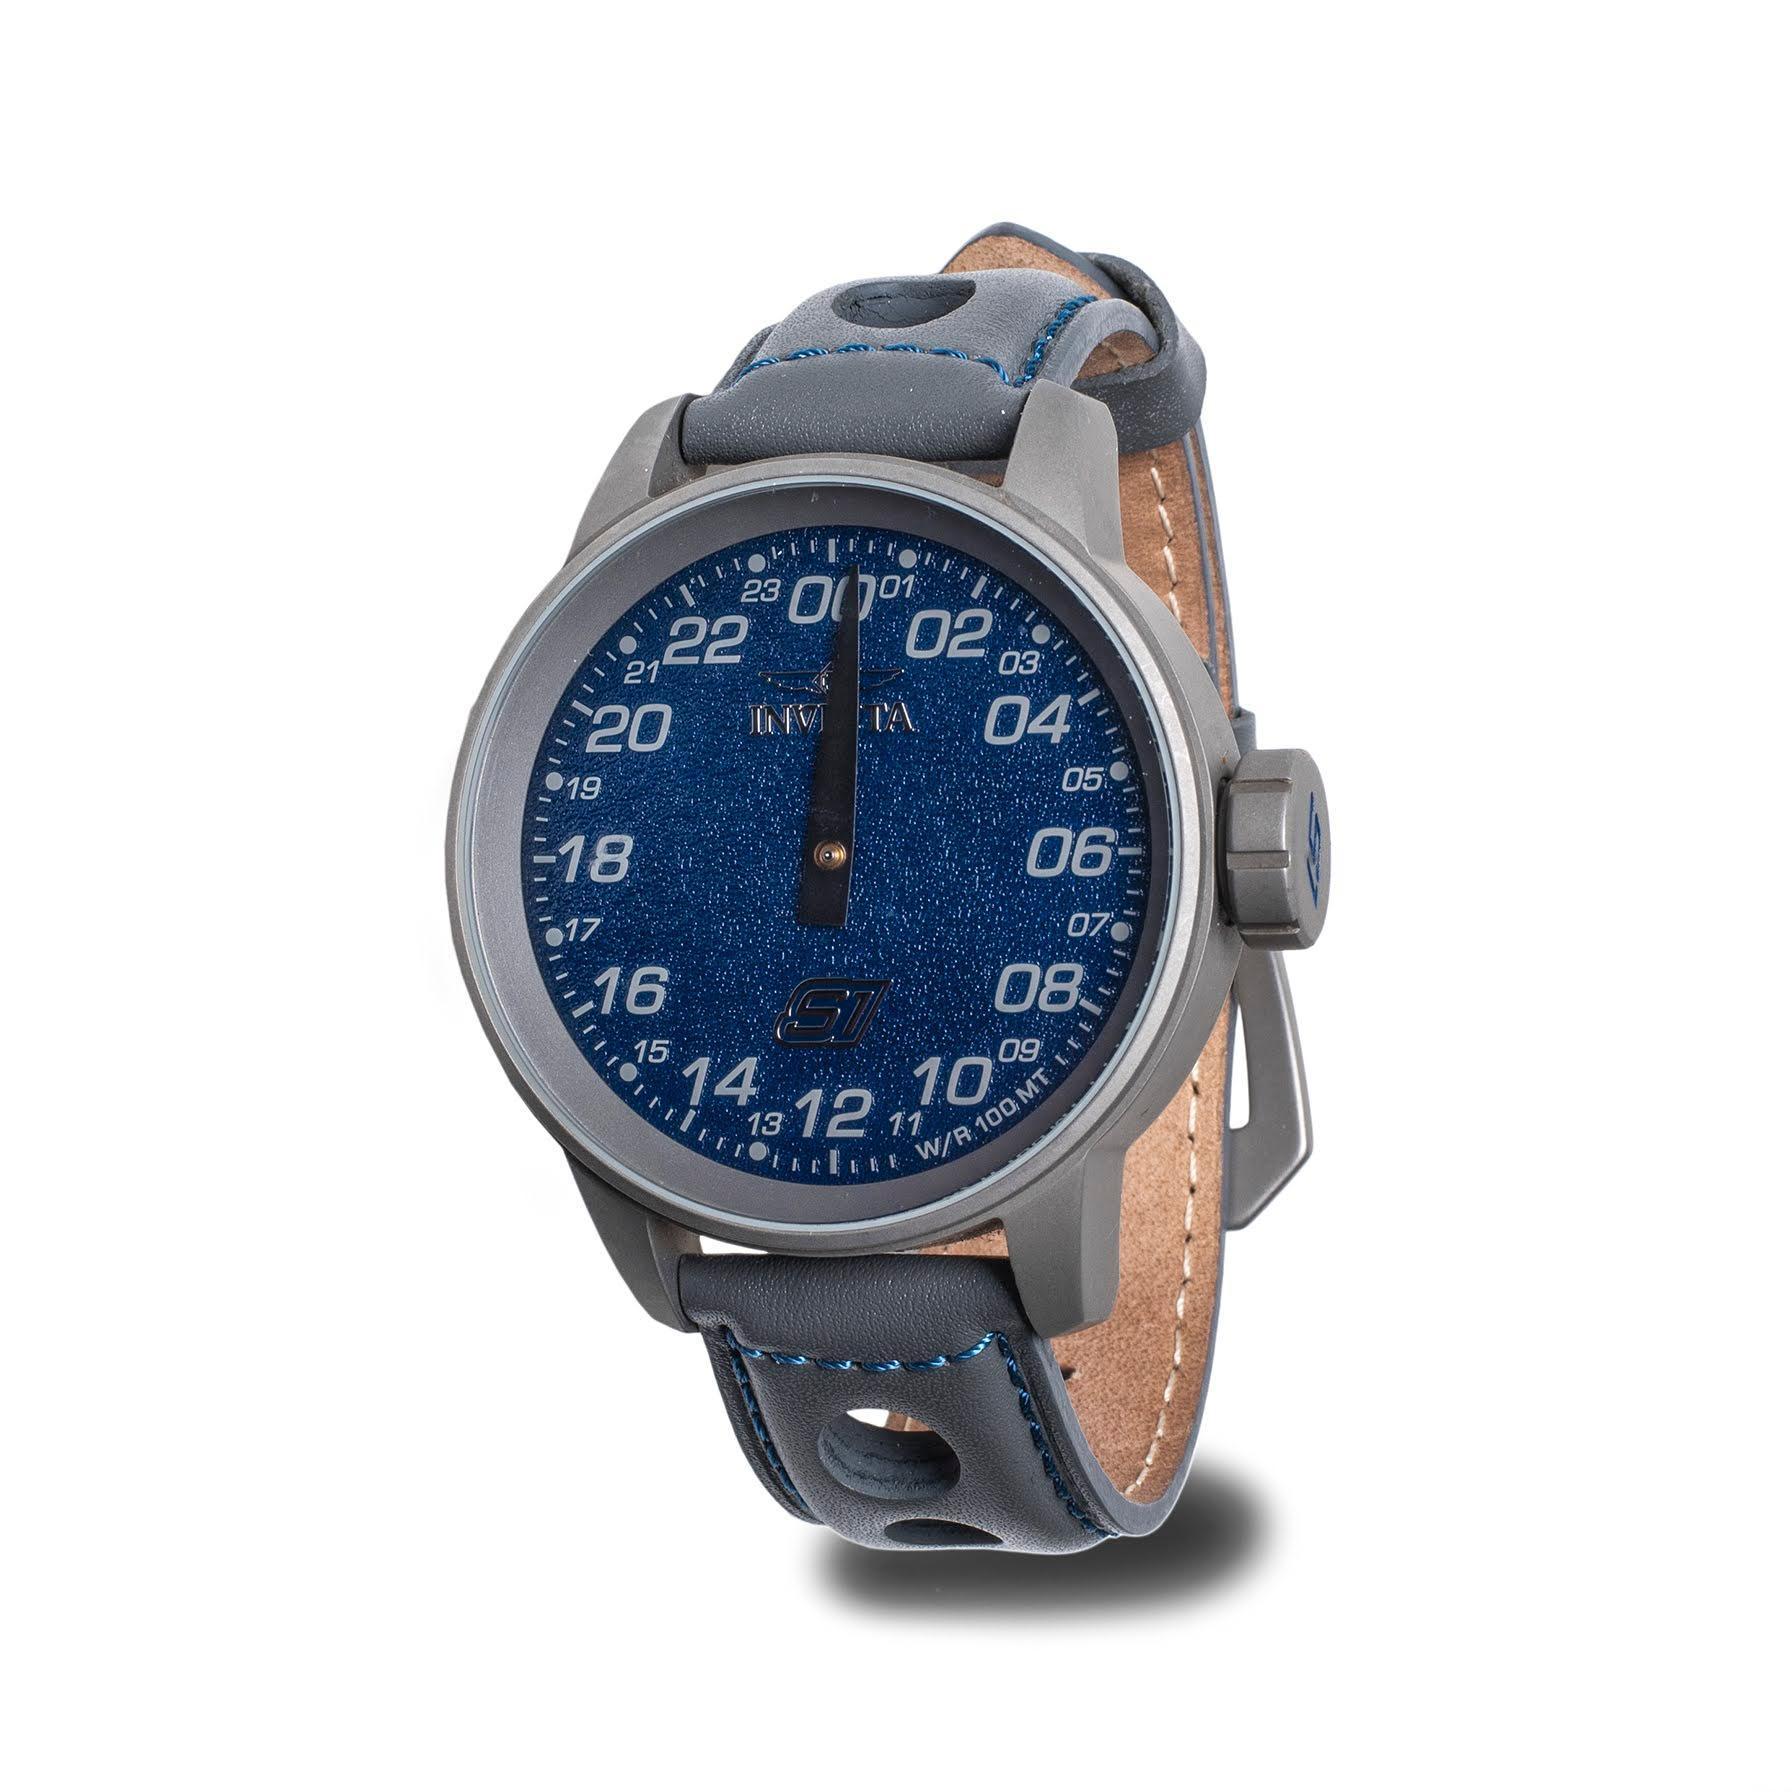 Invicta S1 Rally Watch